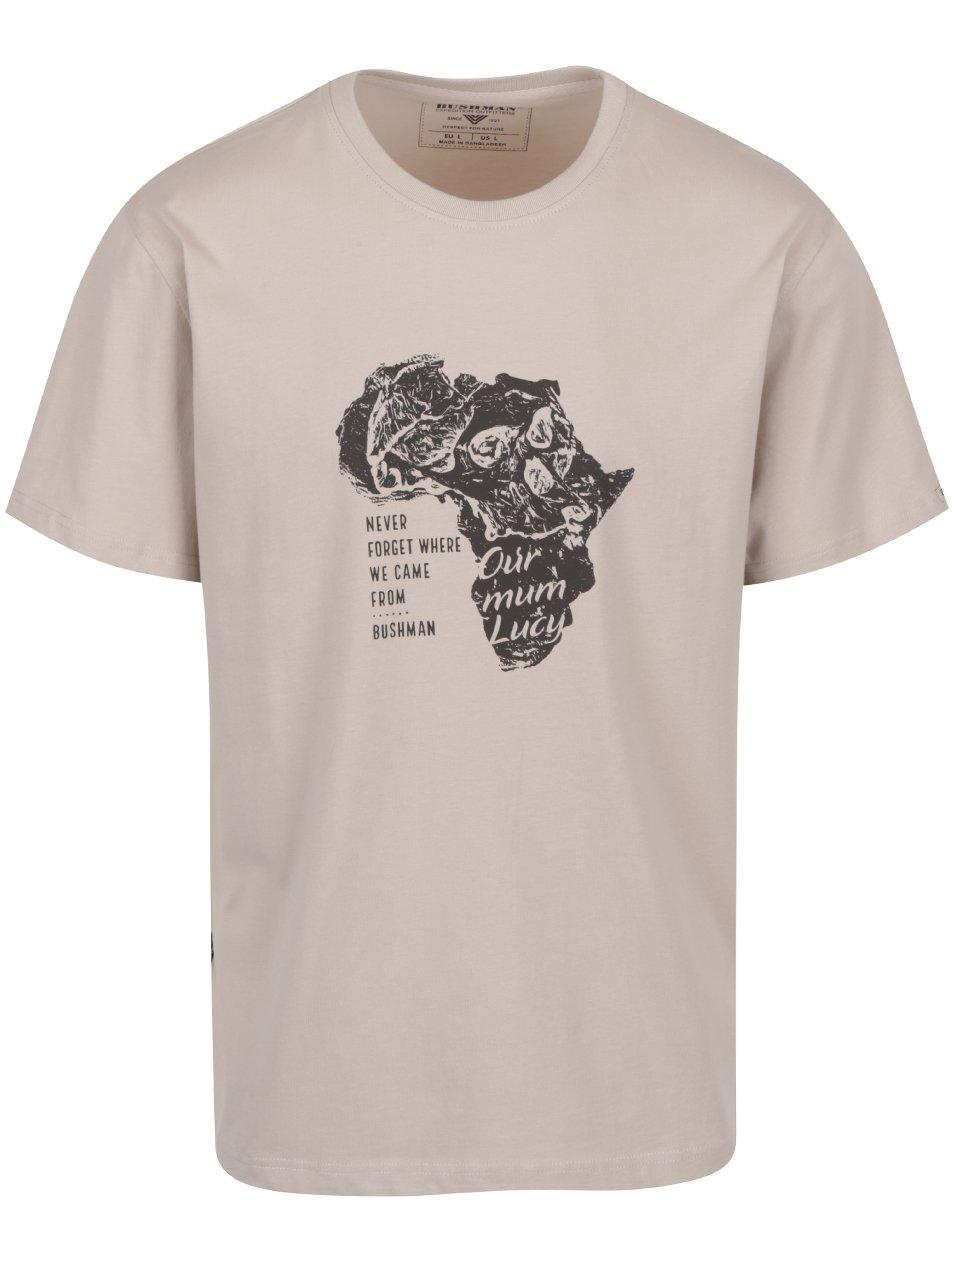 Béžové pánské triko s potiskem BUSHMAN Goliad